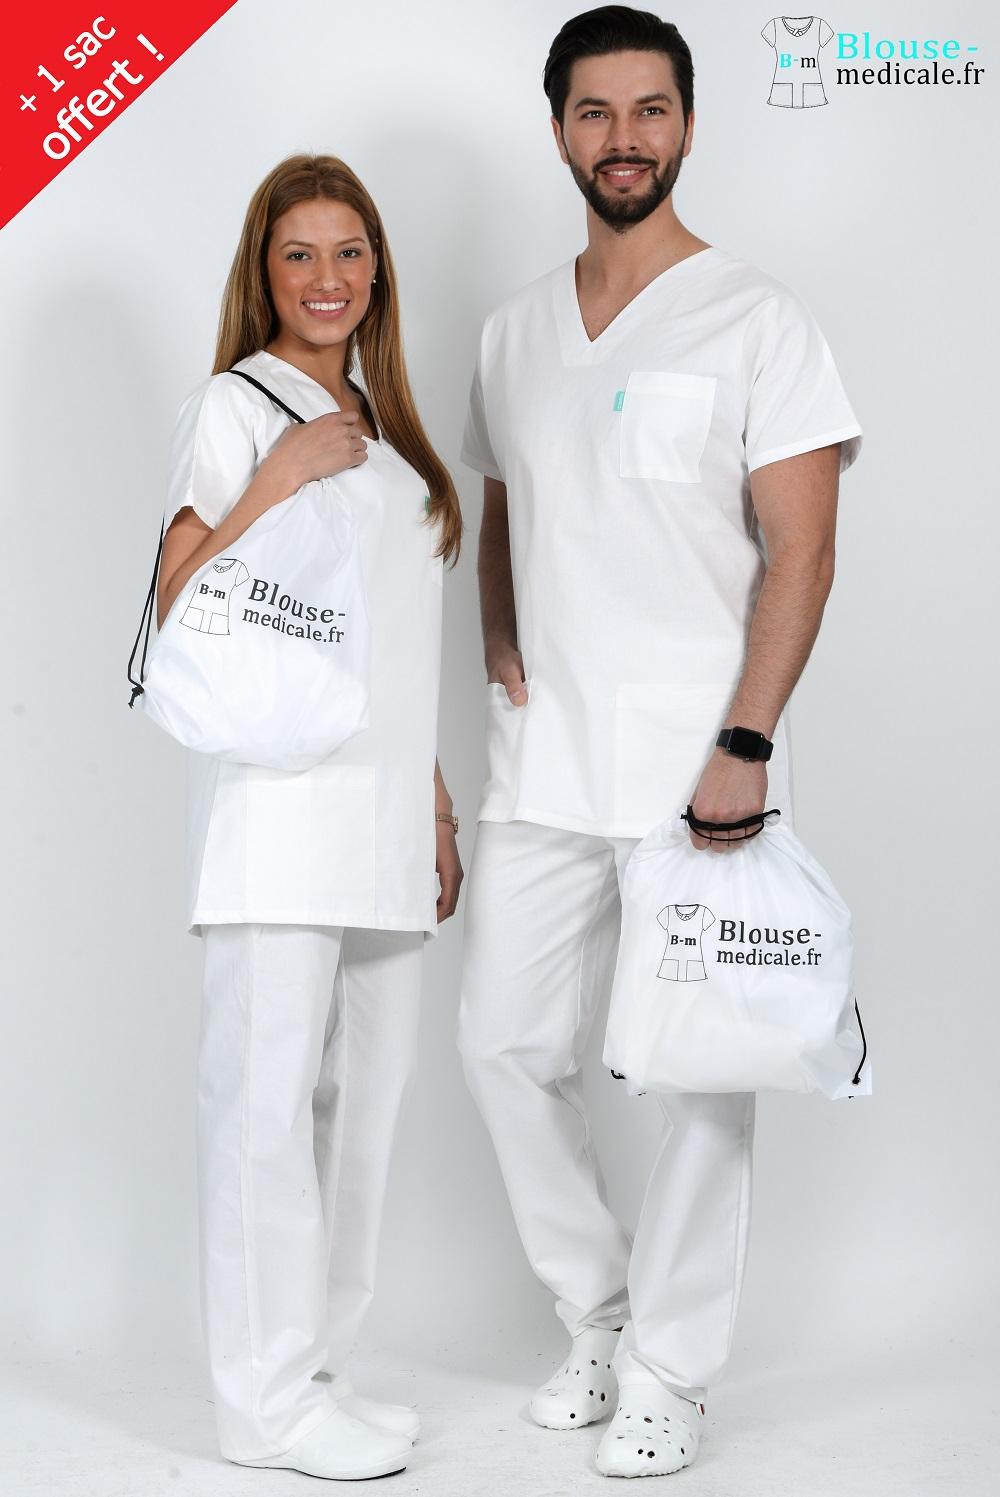 tenue medicale unisexe tenue medicale blanche tenue hopital blanc pas cher